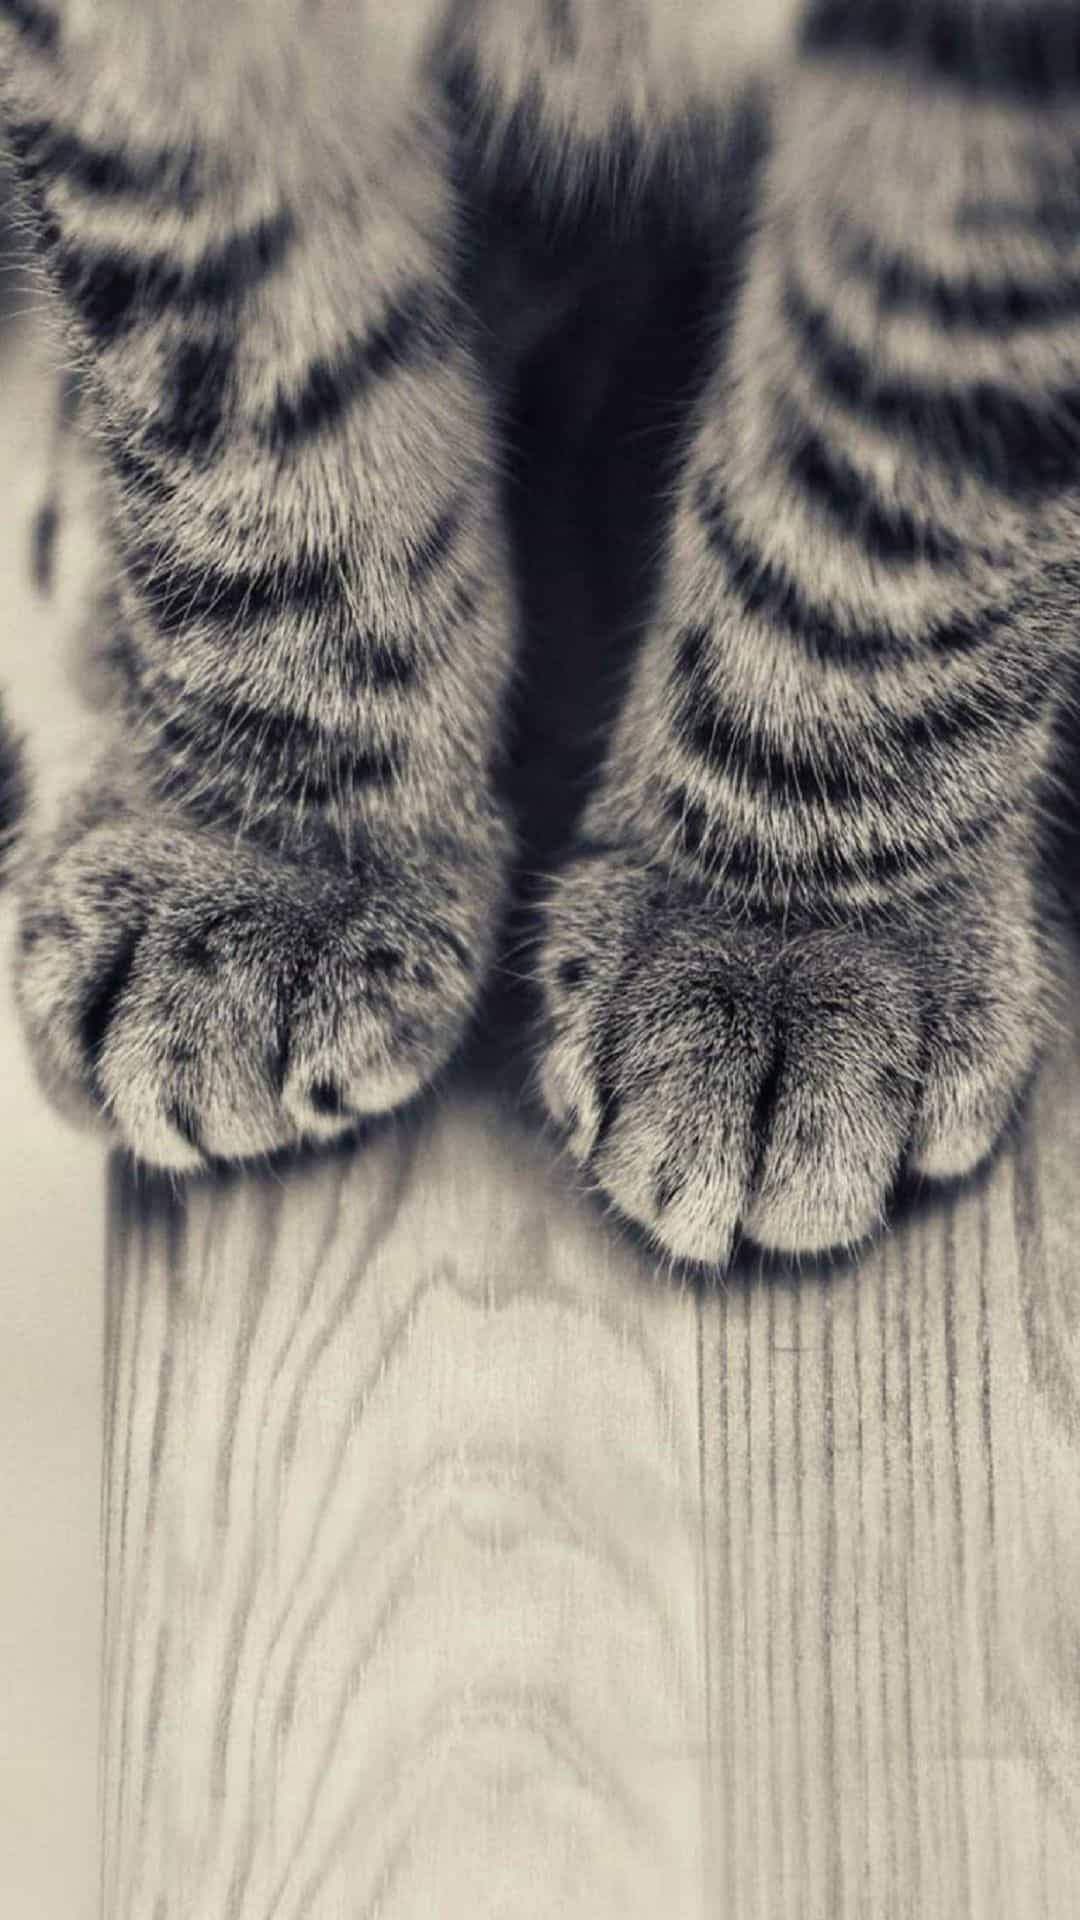 gray-striped-kitten-legs-cat-android-wallpaper